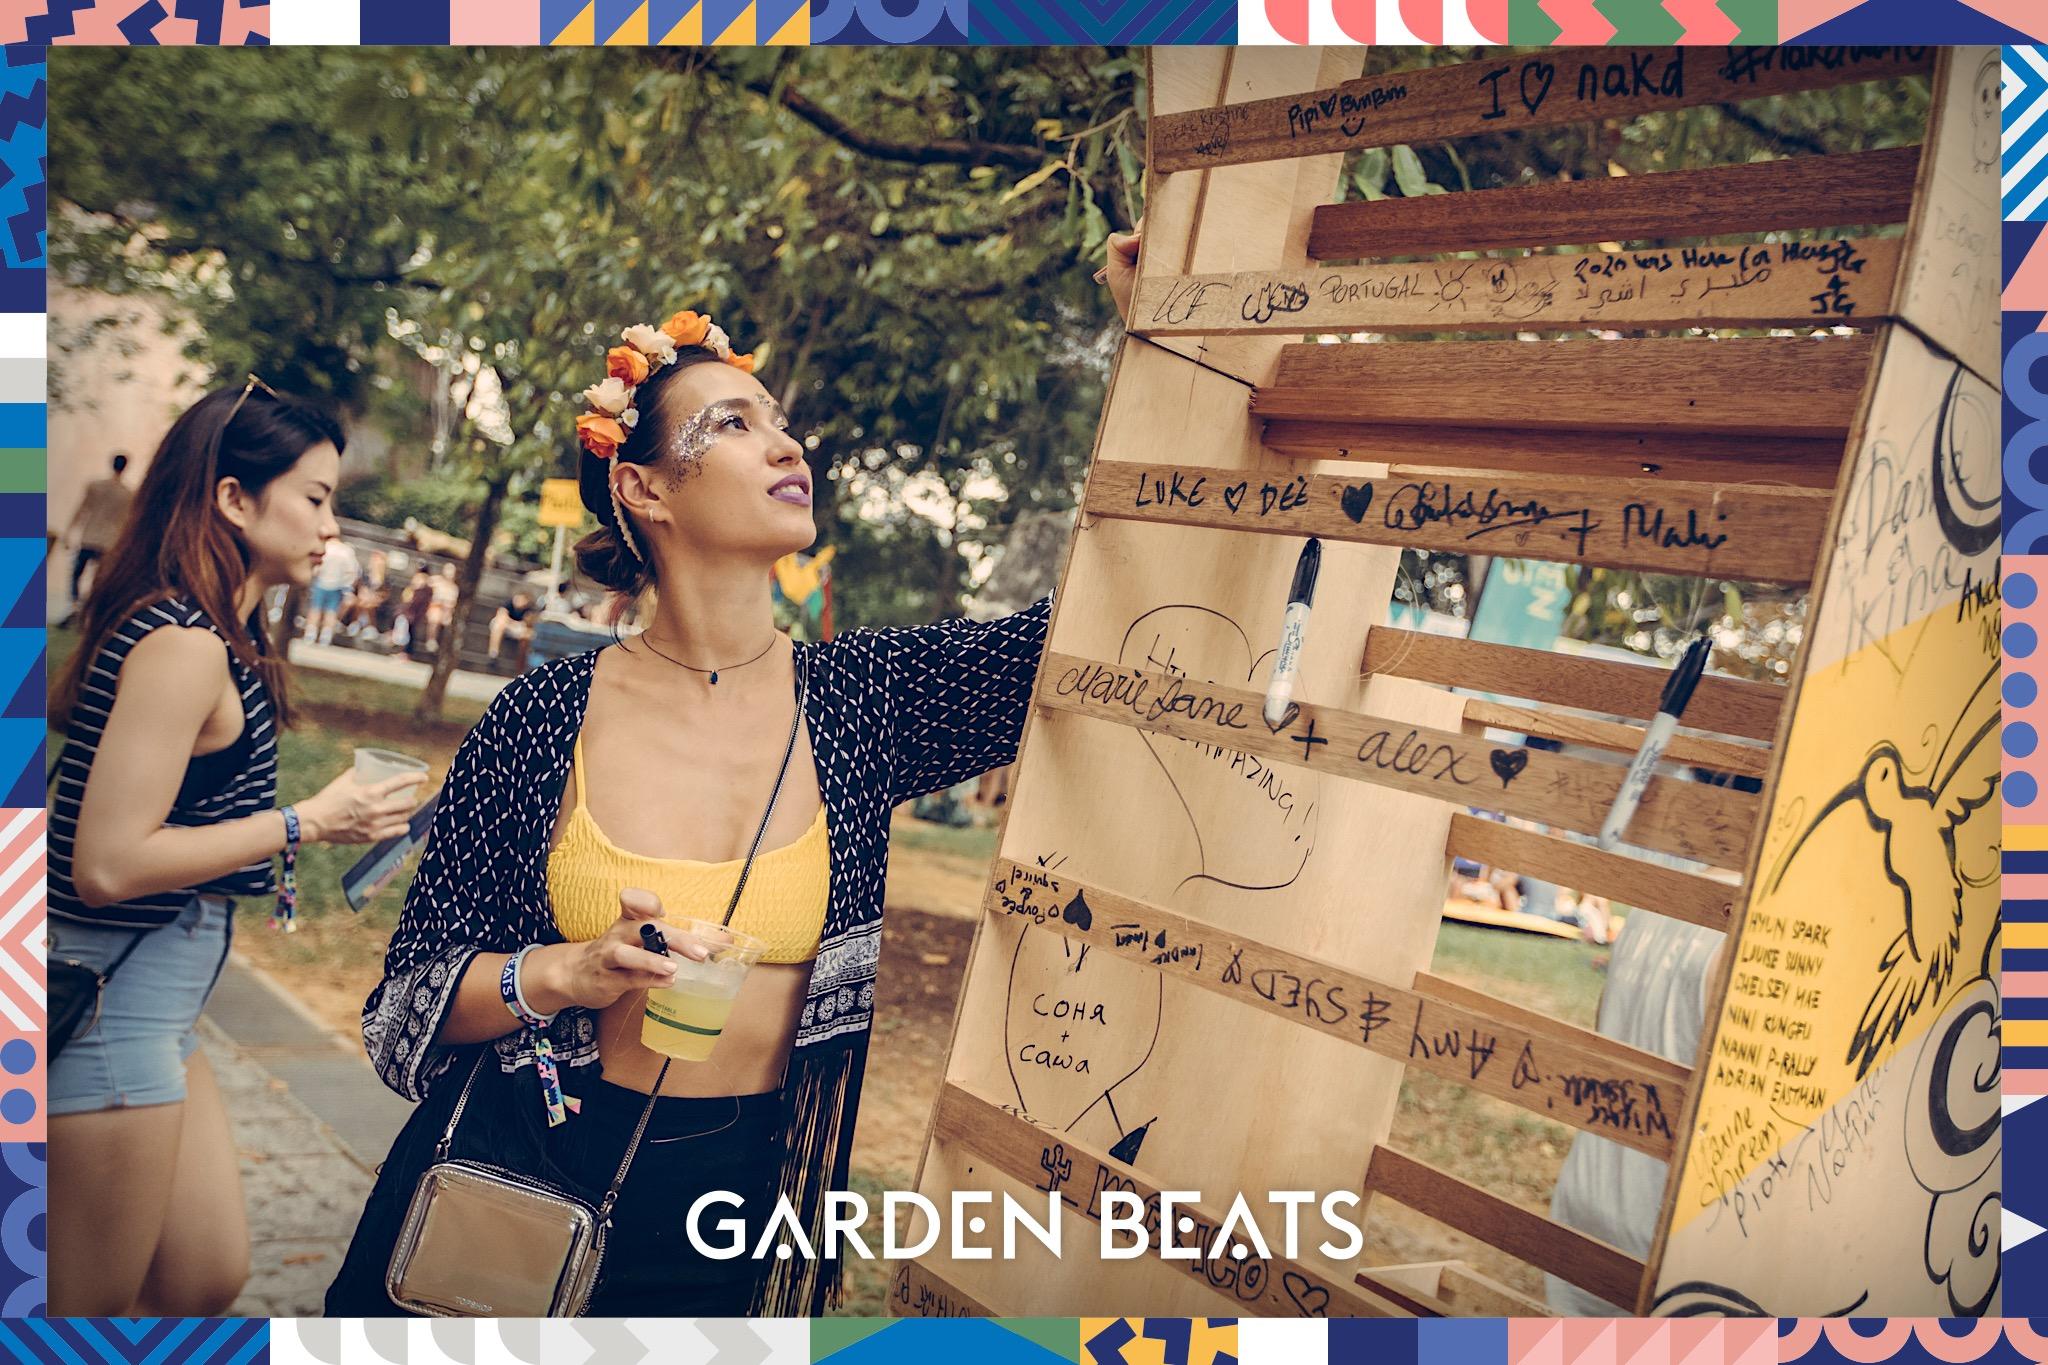 03032018_GardenBeats_Colossal401_Watermarked.jpg